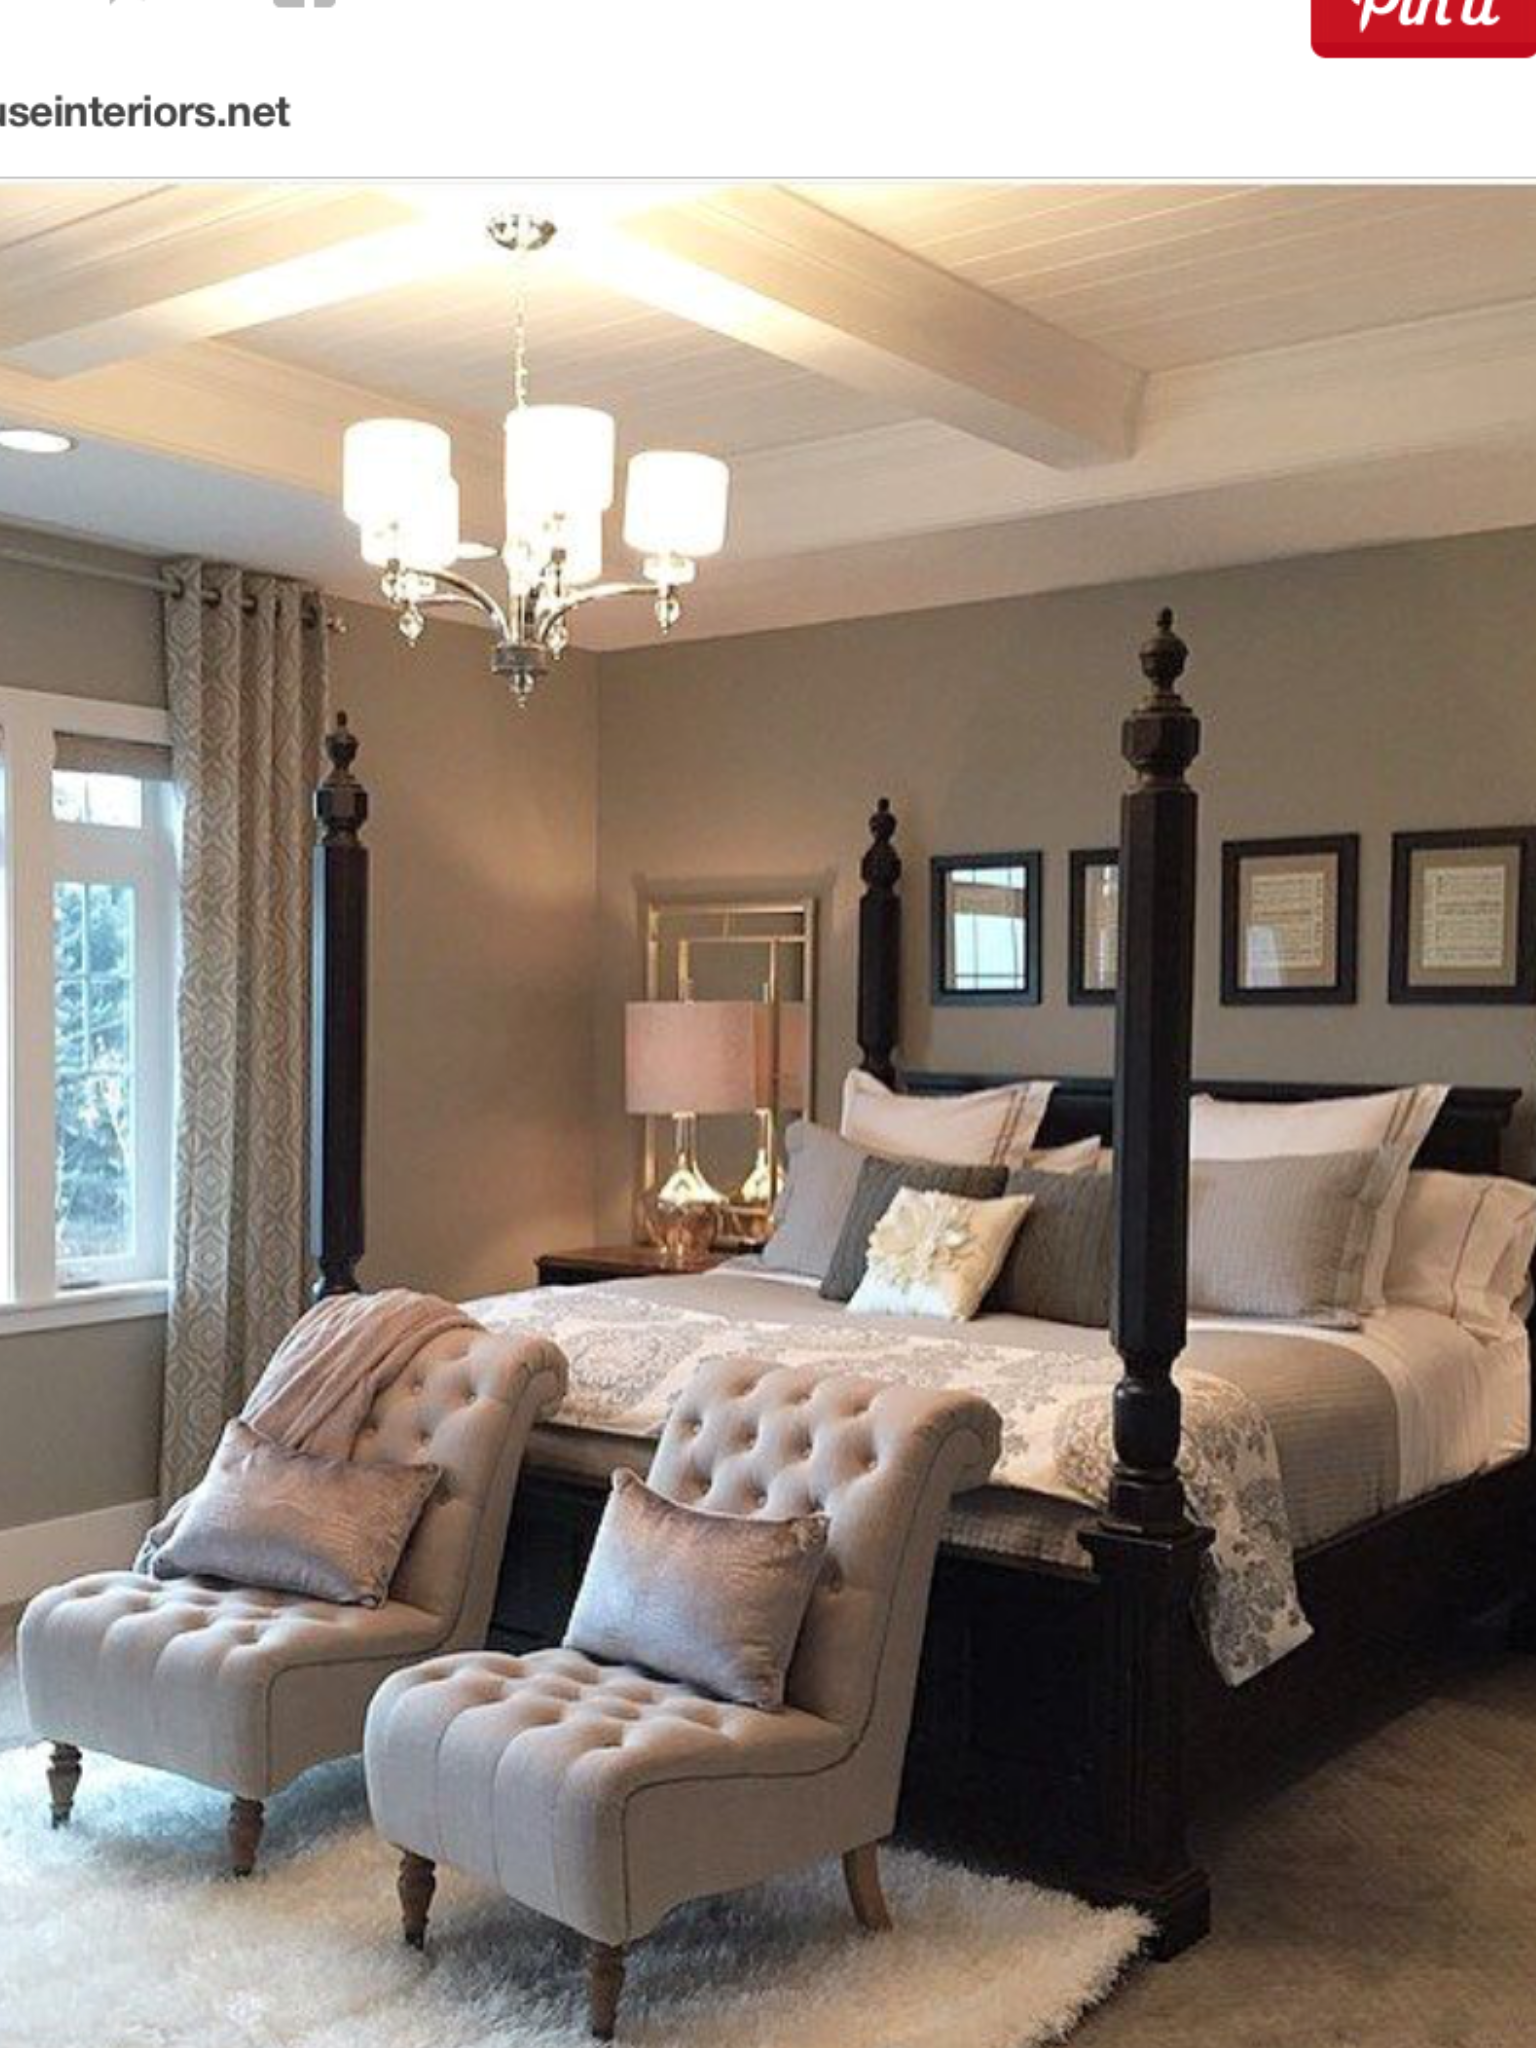 Romantic bedroom master bedroom bedroom decor ideas  Wall color  JBus house  Pinterest  Bedroom Master Bedroom and